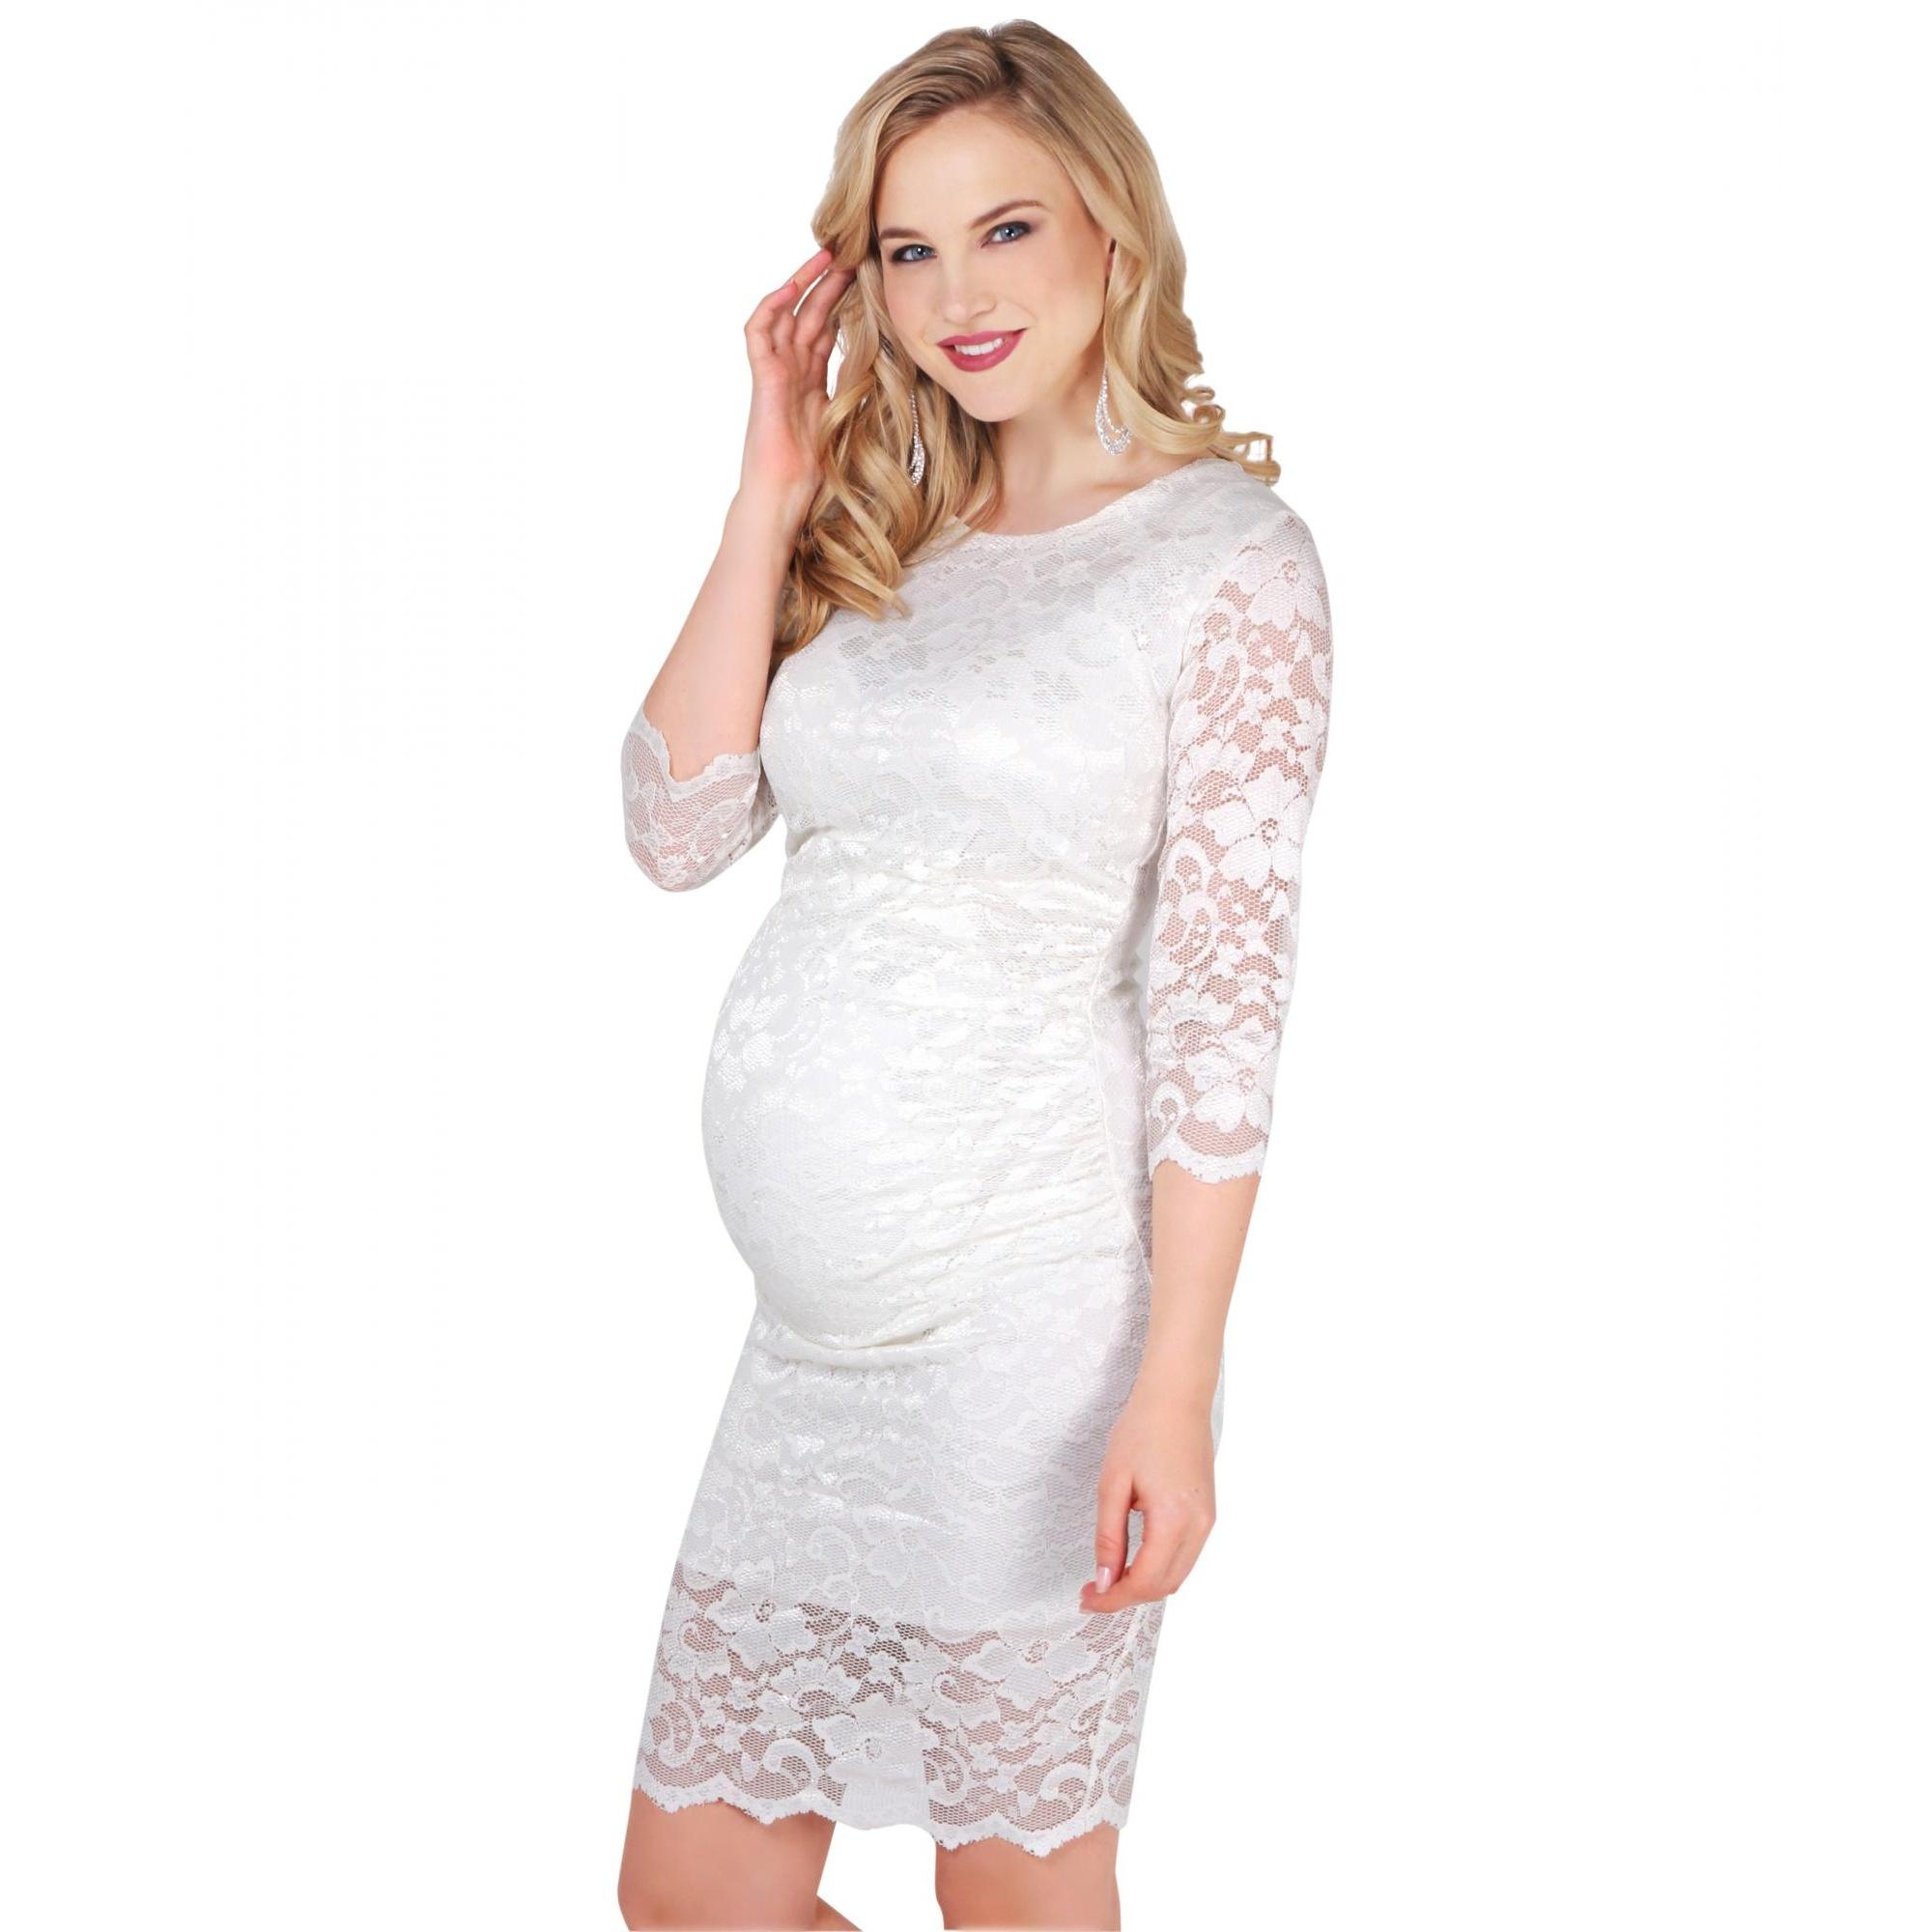 Krisp Womens/Ladies Maternity 3/4 Length Sleeve Lace Midi Dress (S) (Cream)